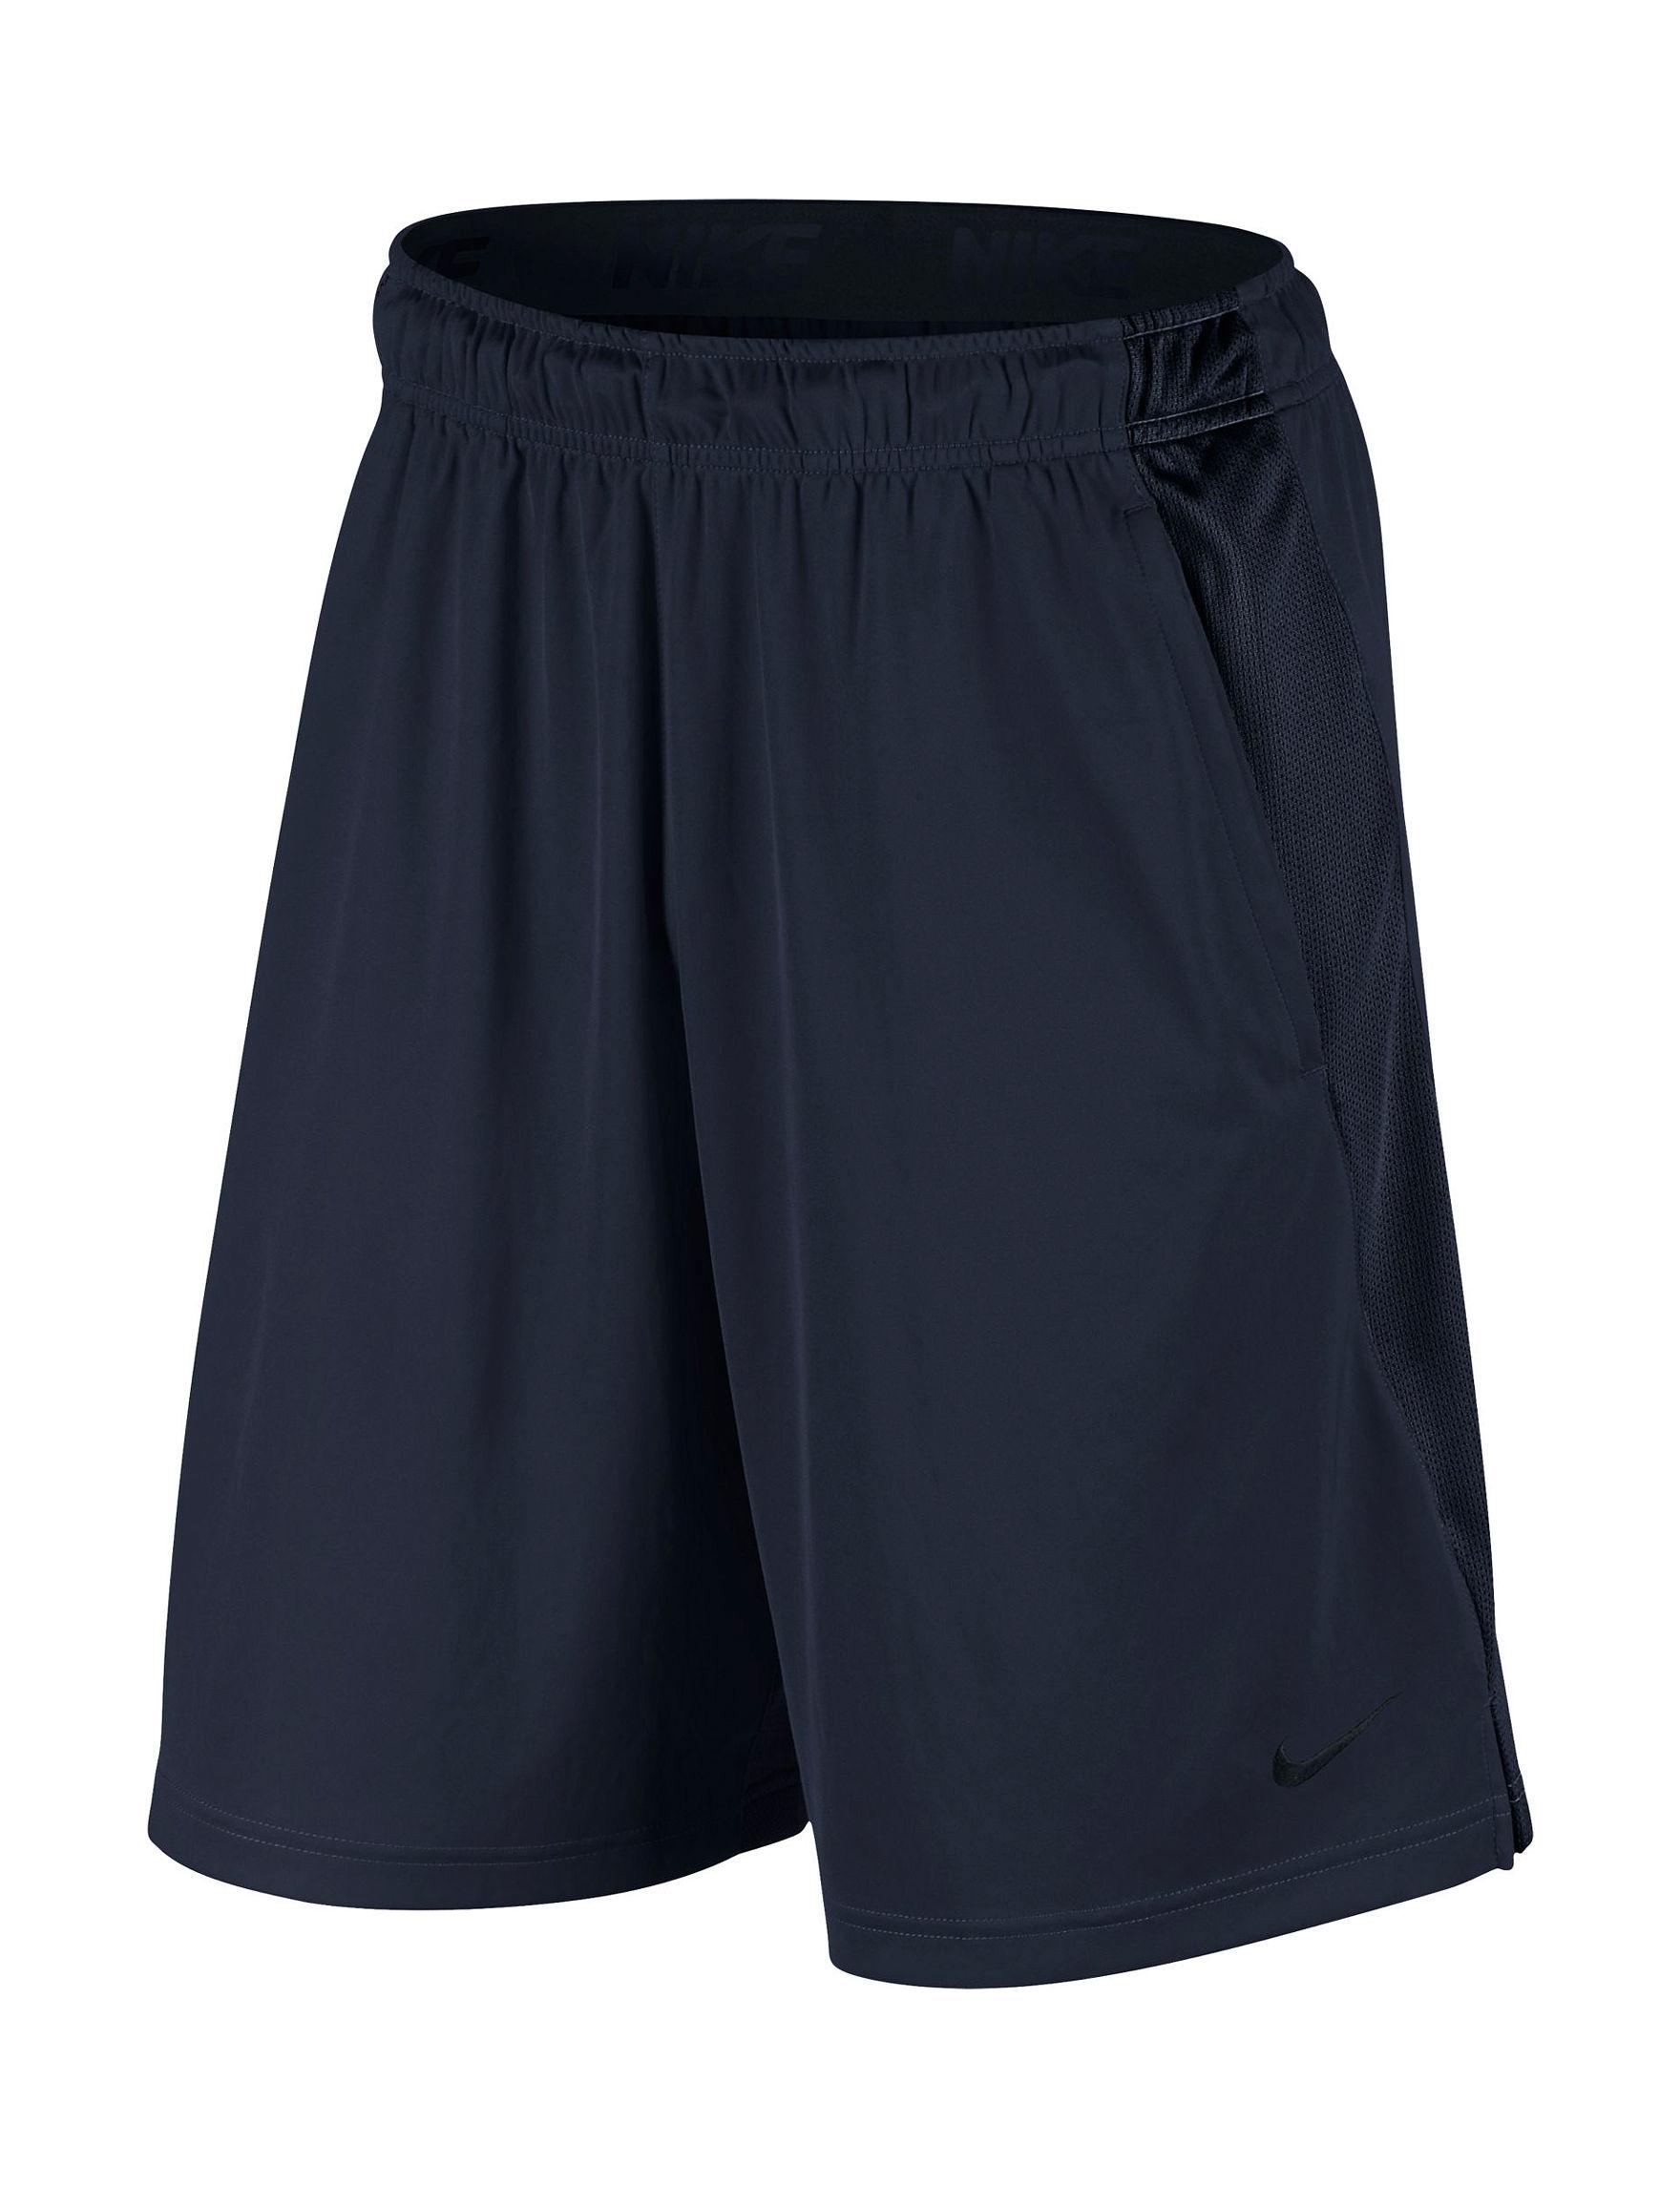 Nike Navy